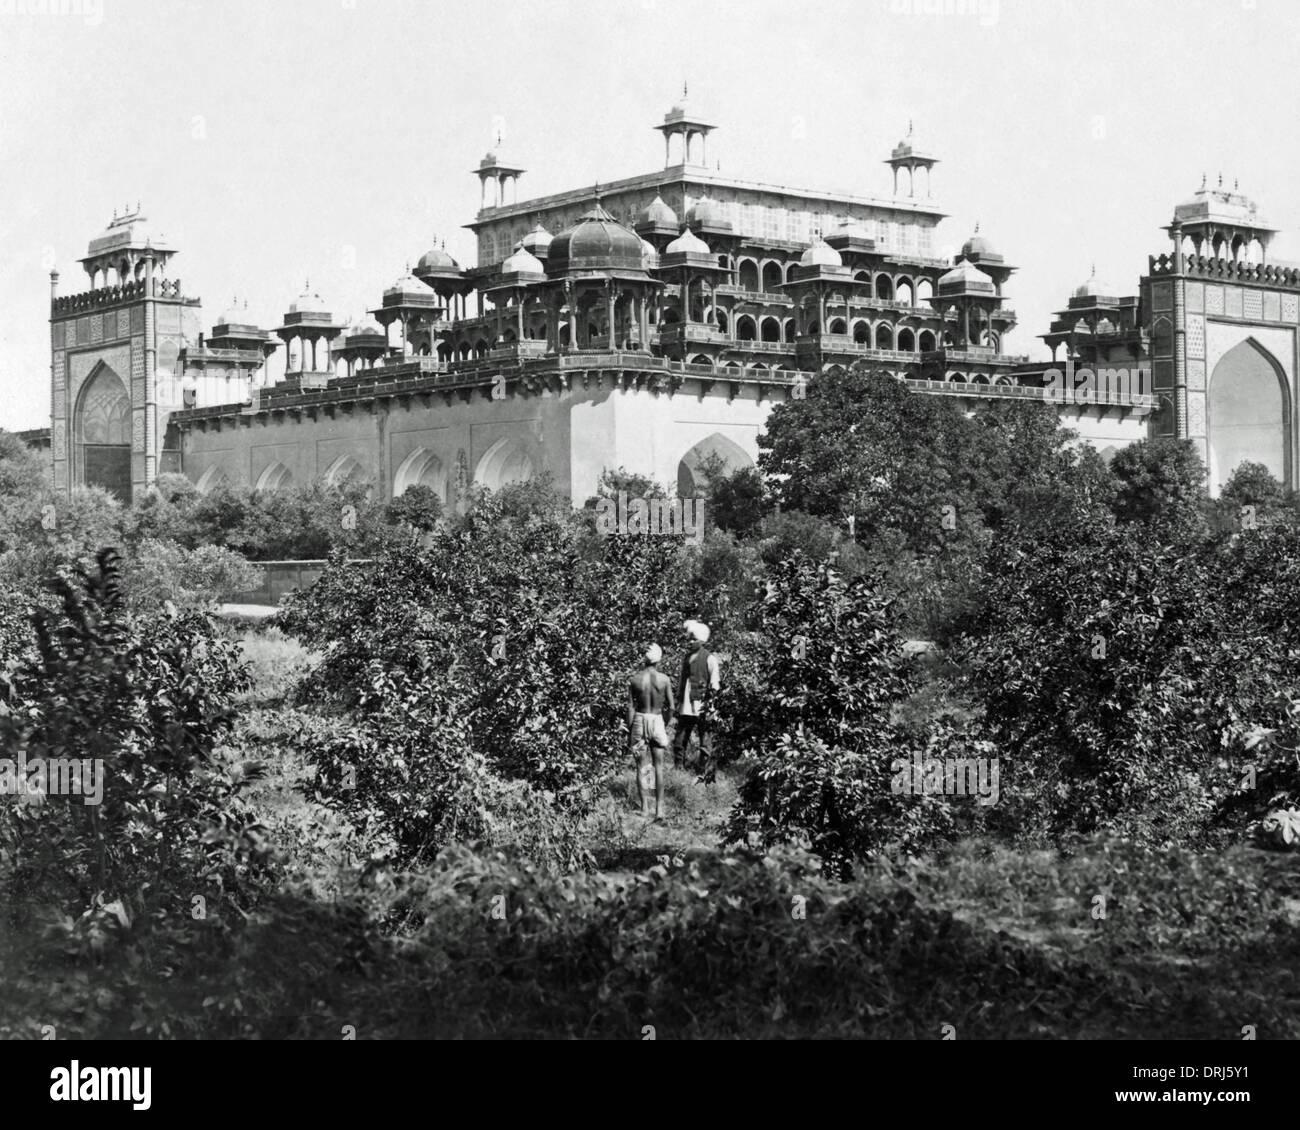 Mausoleum of Akbar, Sikandara, Agra, India - Stock Image